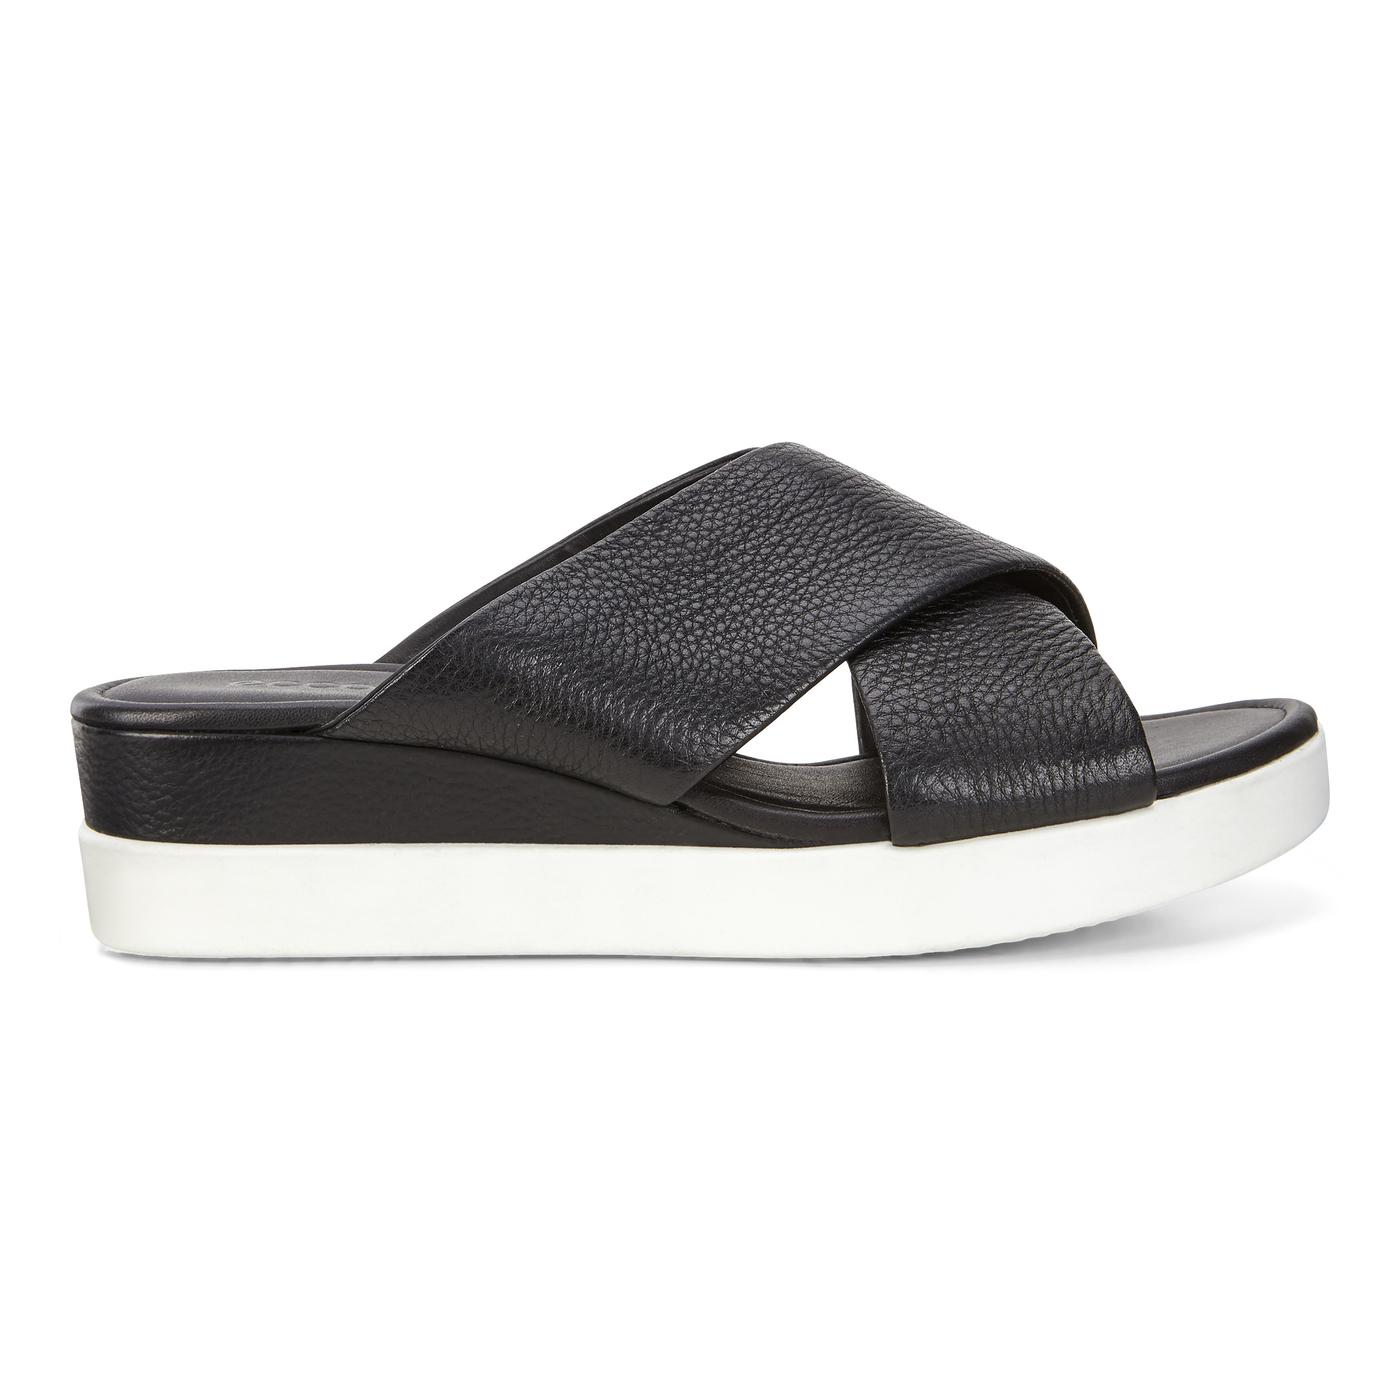 6a4f23fc88b0 ECCO Touch Slide Sandal